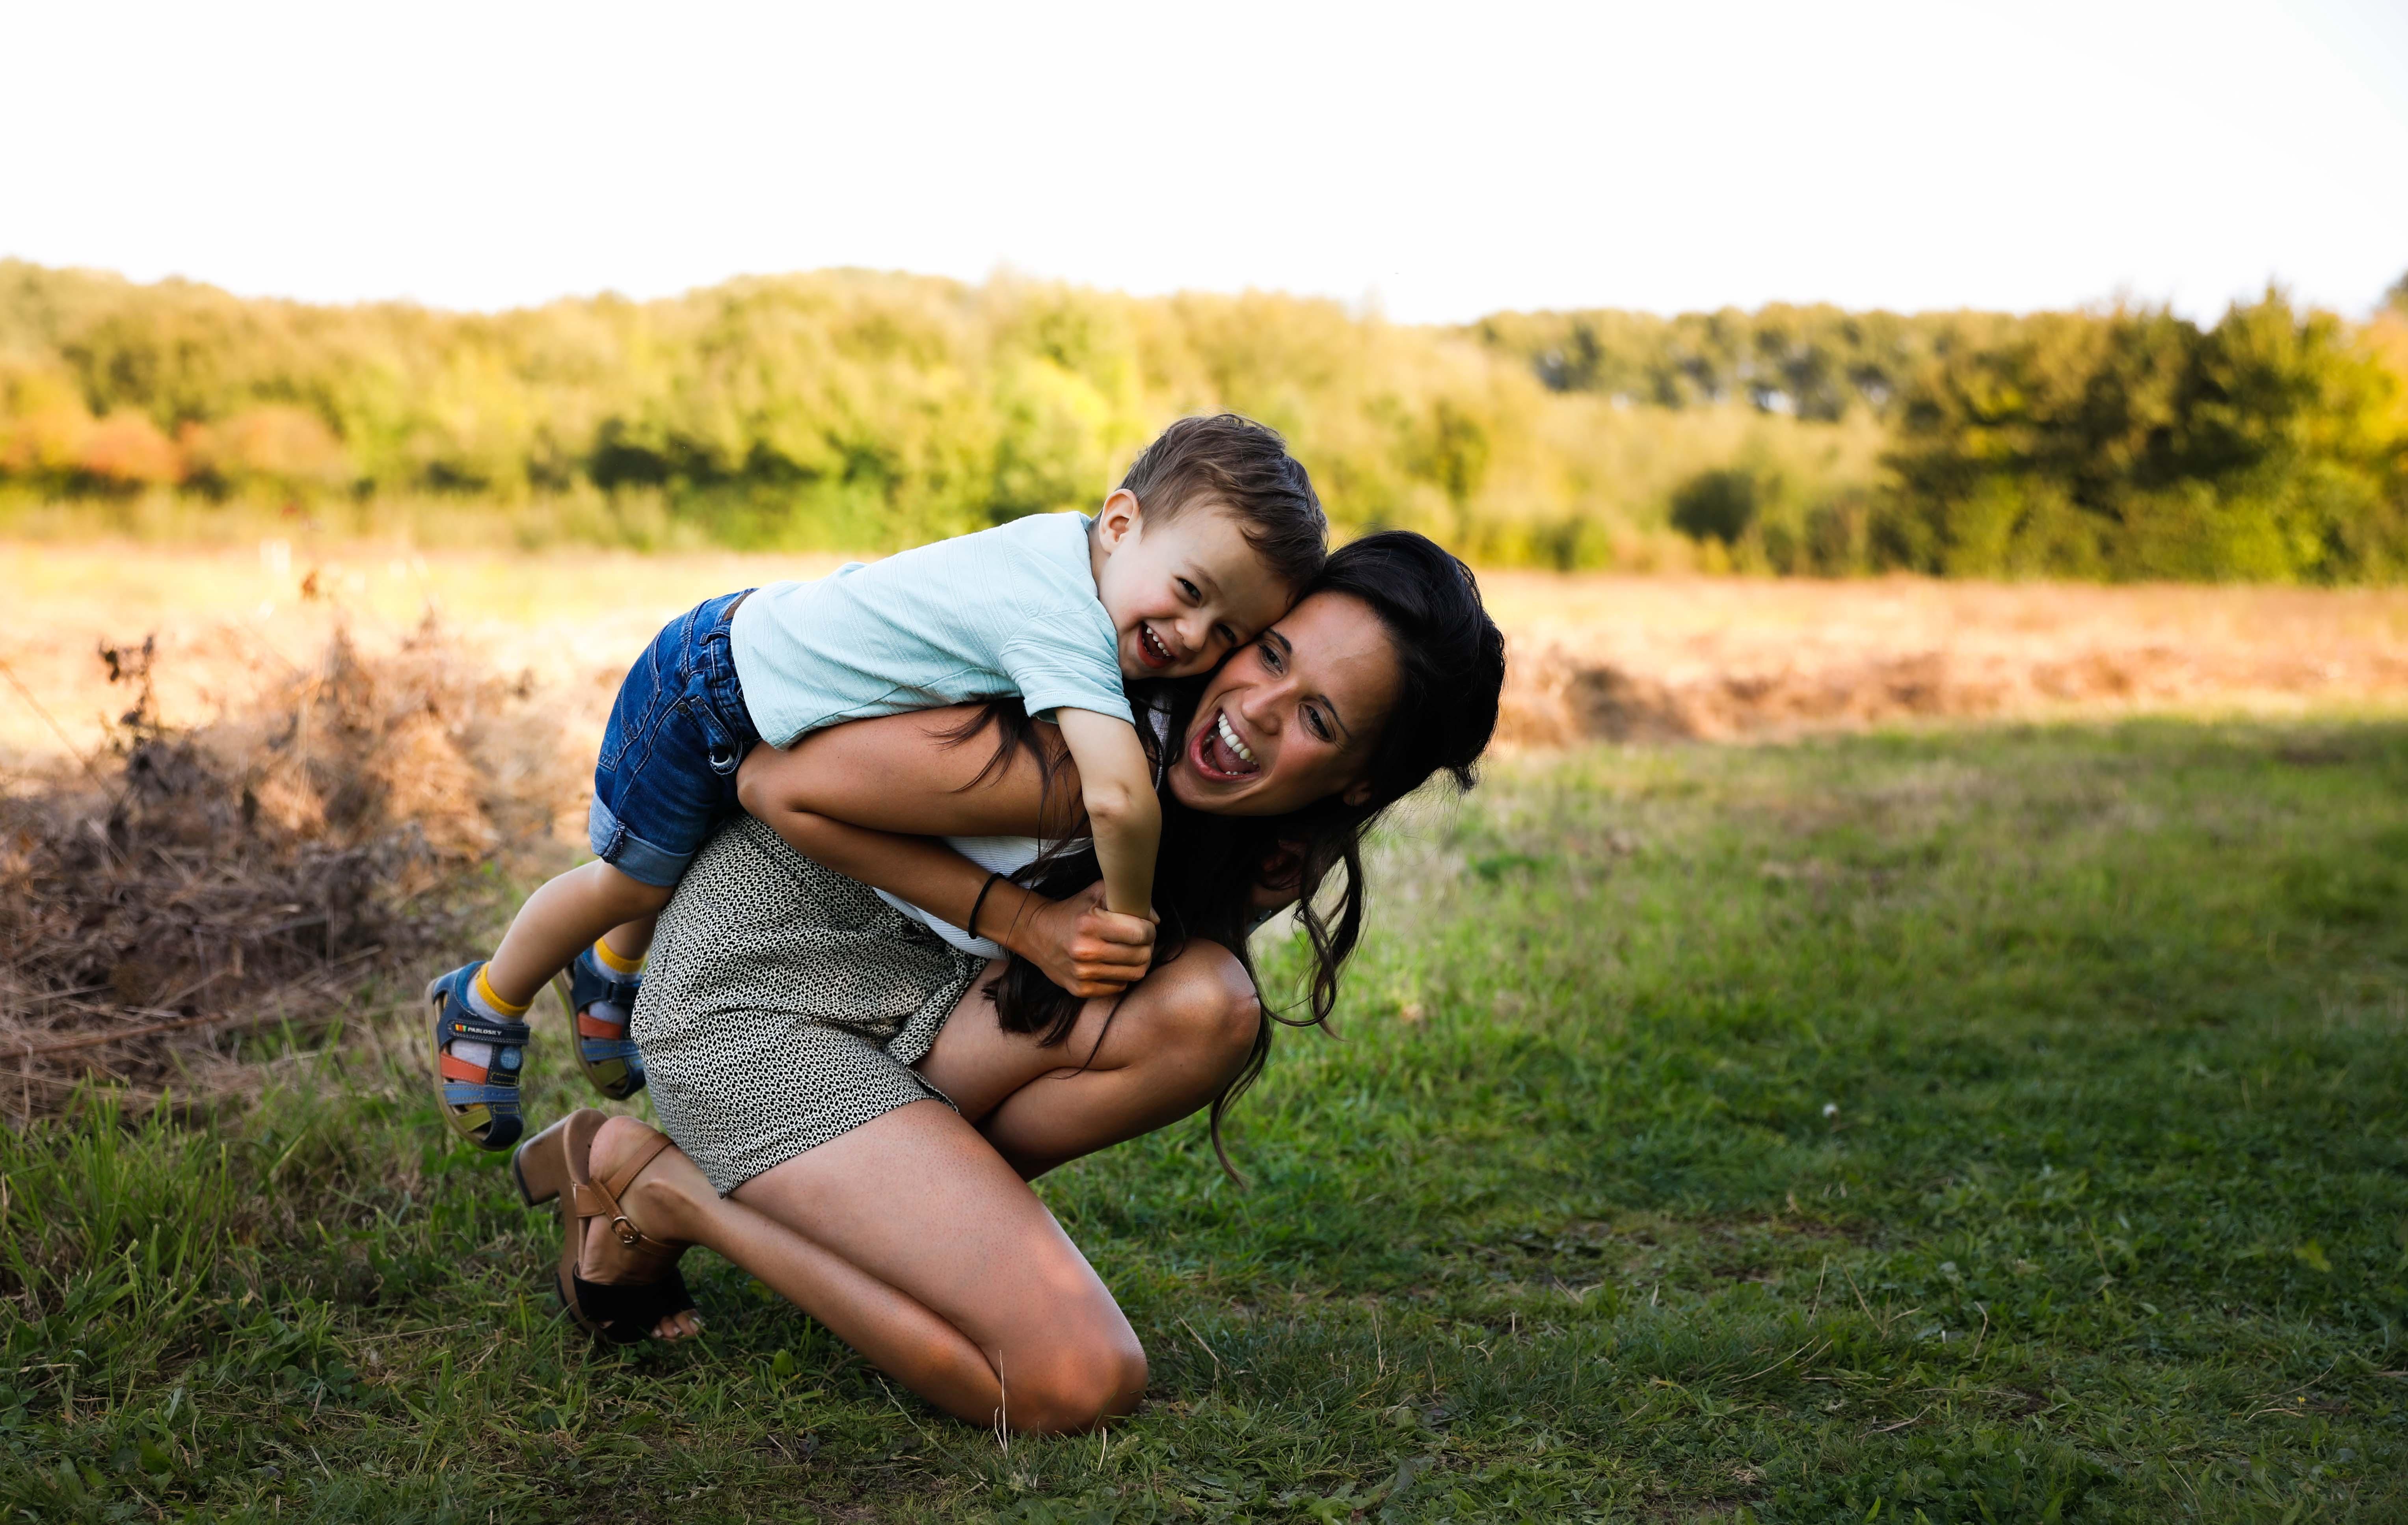 claudialeclercq-familyphotography-photographiedefamille-fotografiafamilia-25